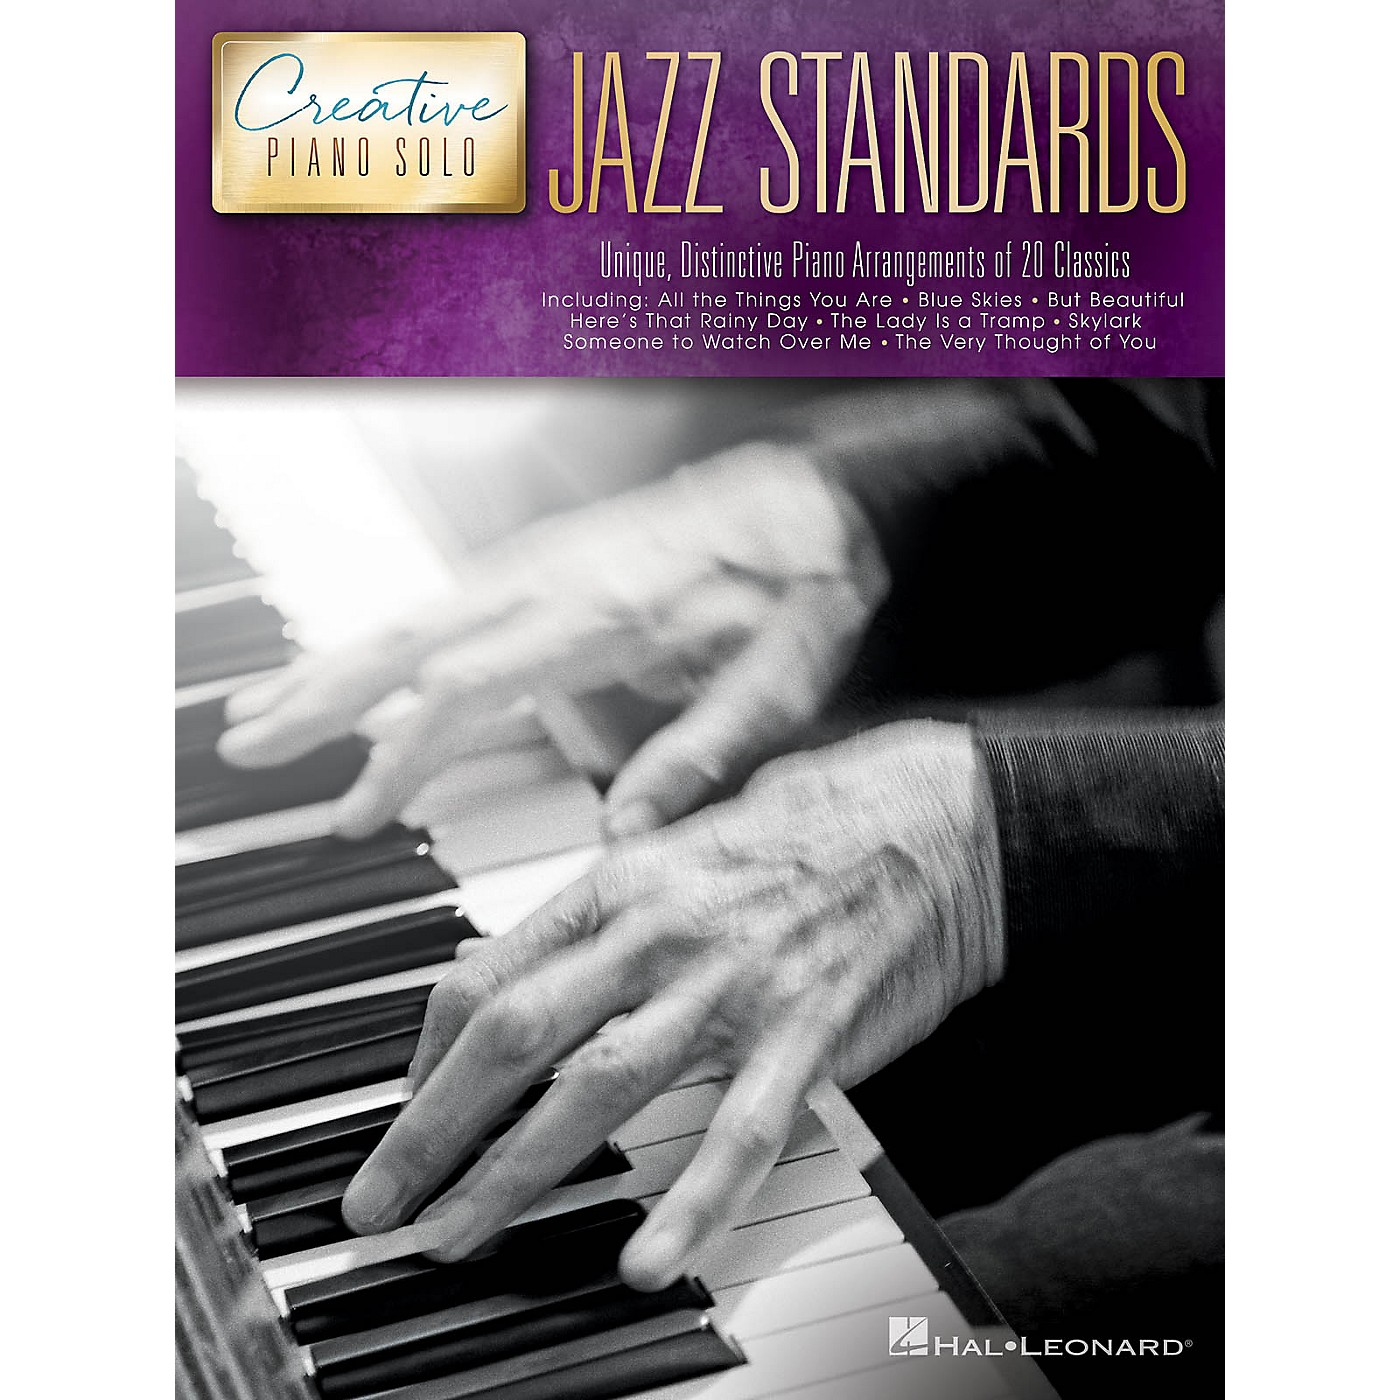 Hal Leonard Jazz Standards - Creative Piano Solo Series Songbook thumbnail